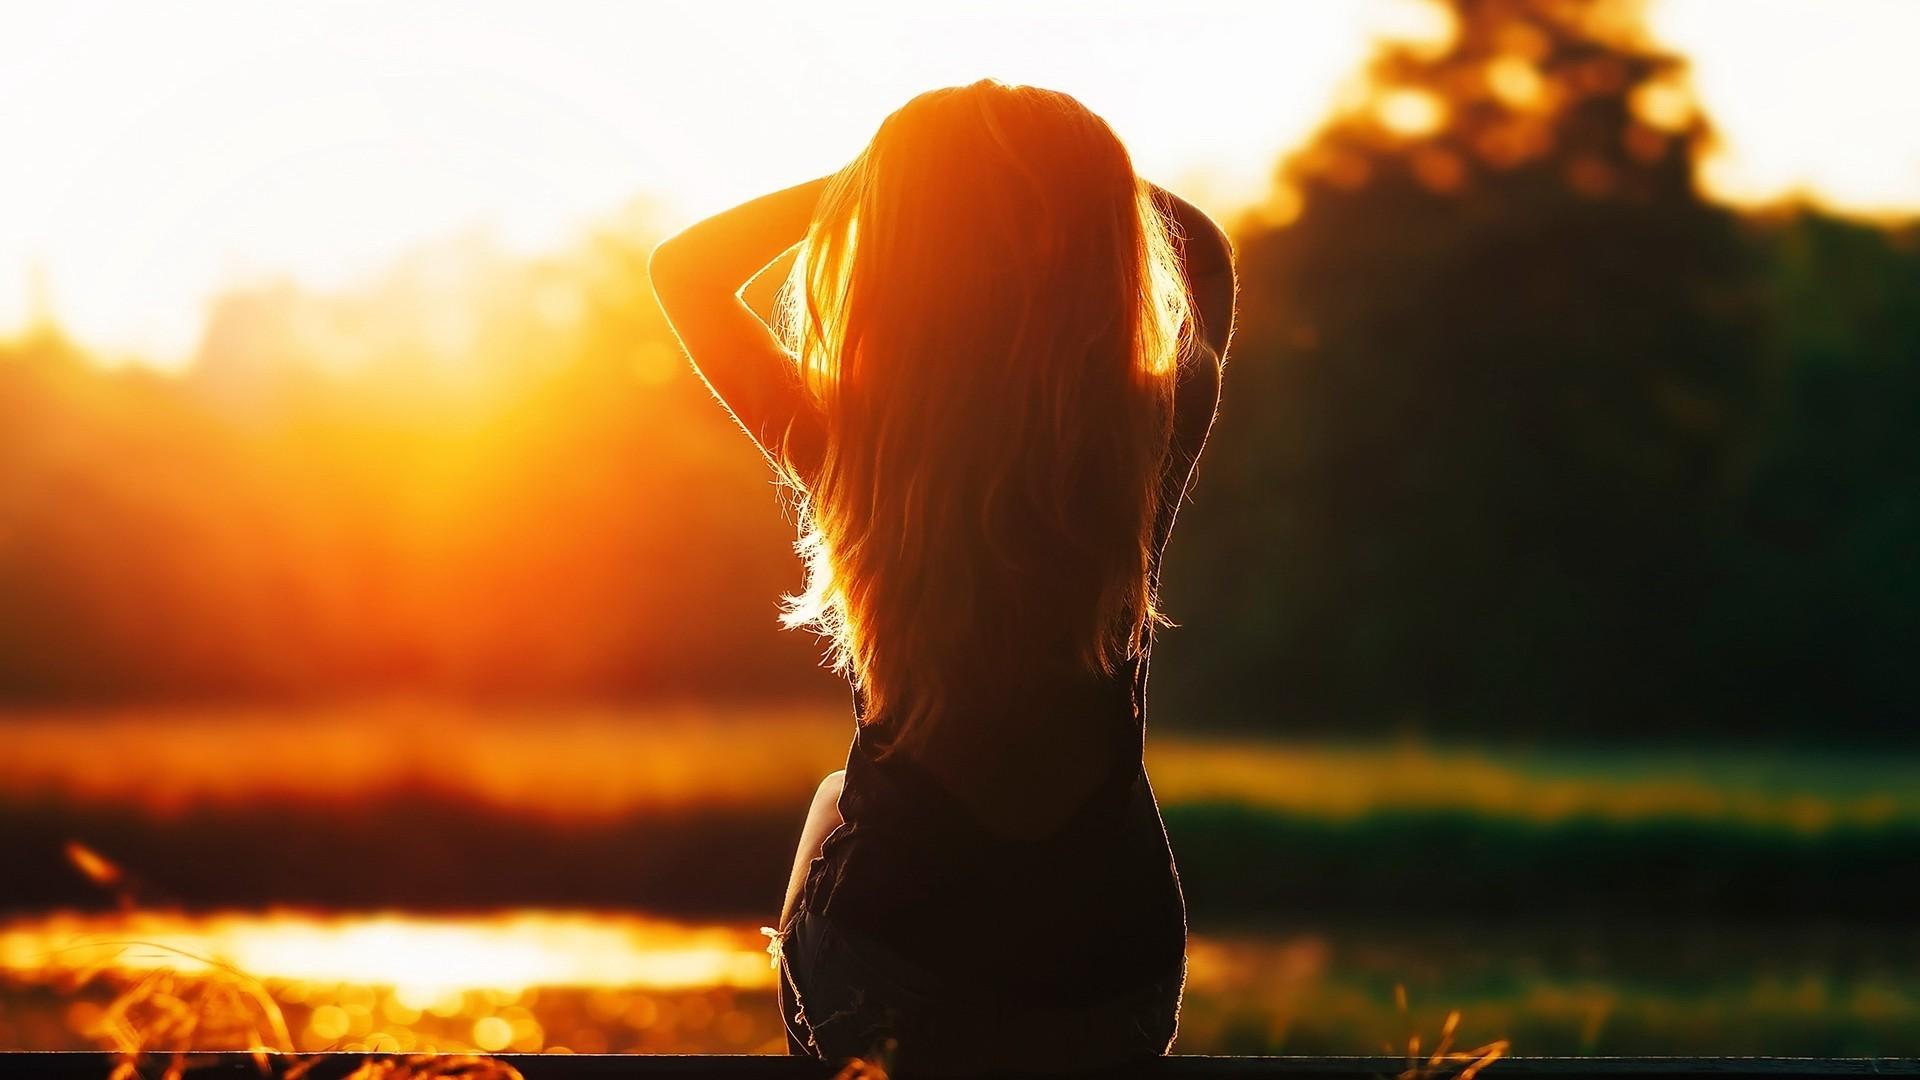 8aa4c4d43a luz de sol mujer puesta de sol silueta amanecer noche Mañana contraluz  oscuridad ligero flor 1920x1080